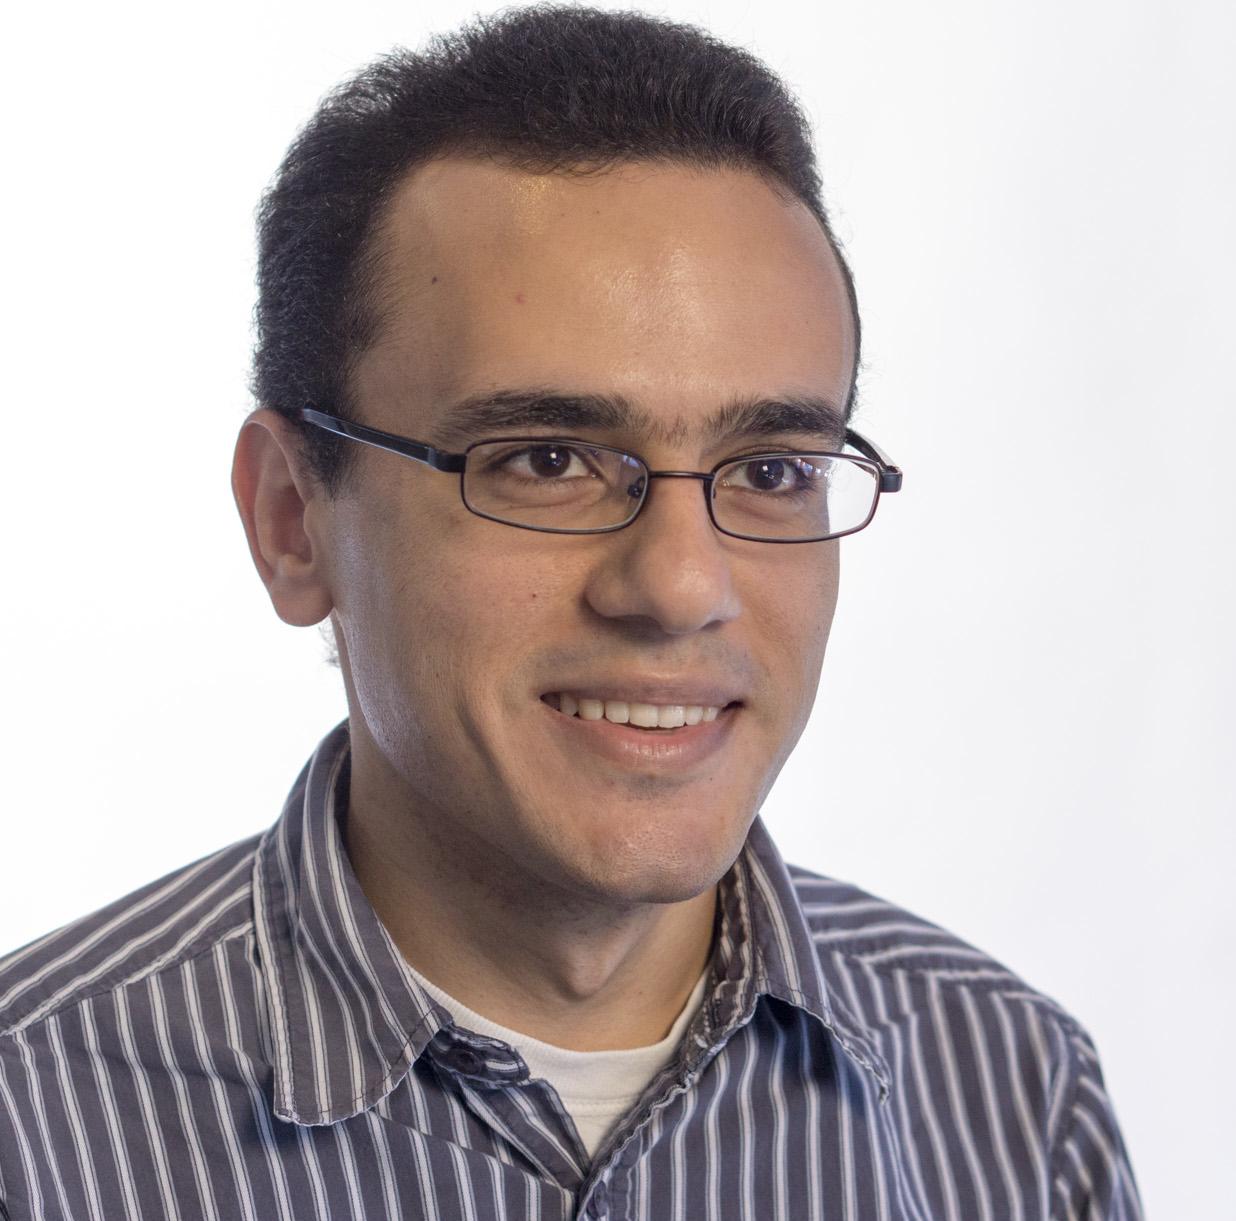 Amr Suleiman